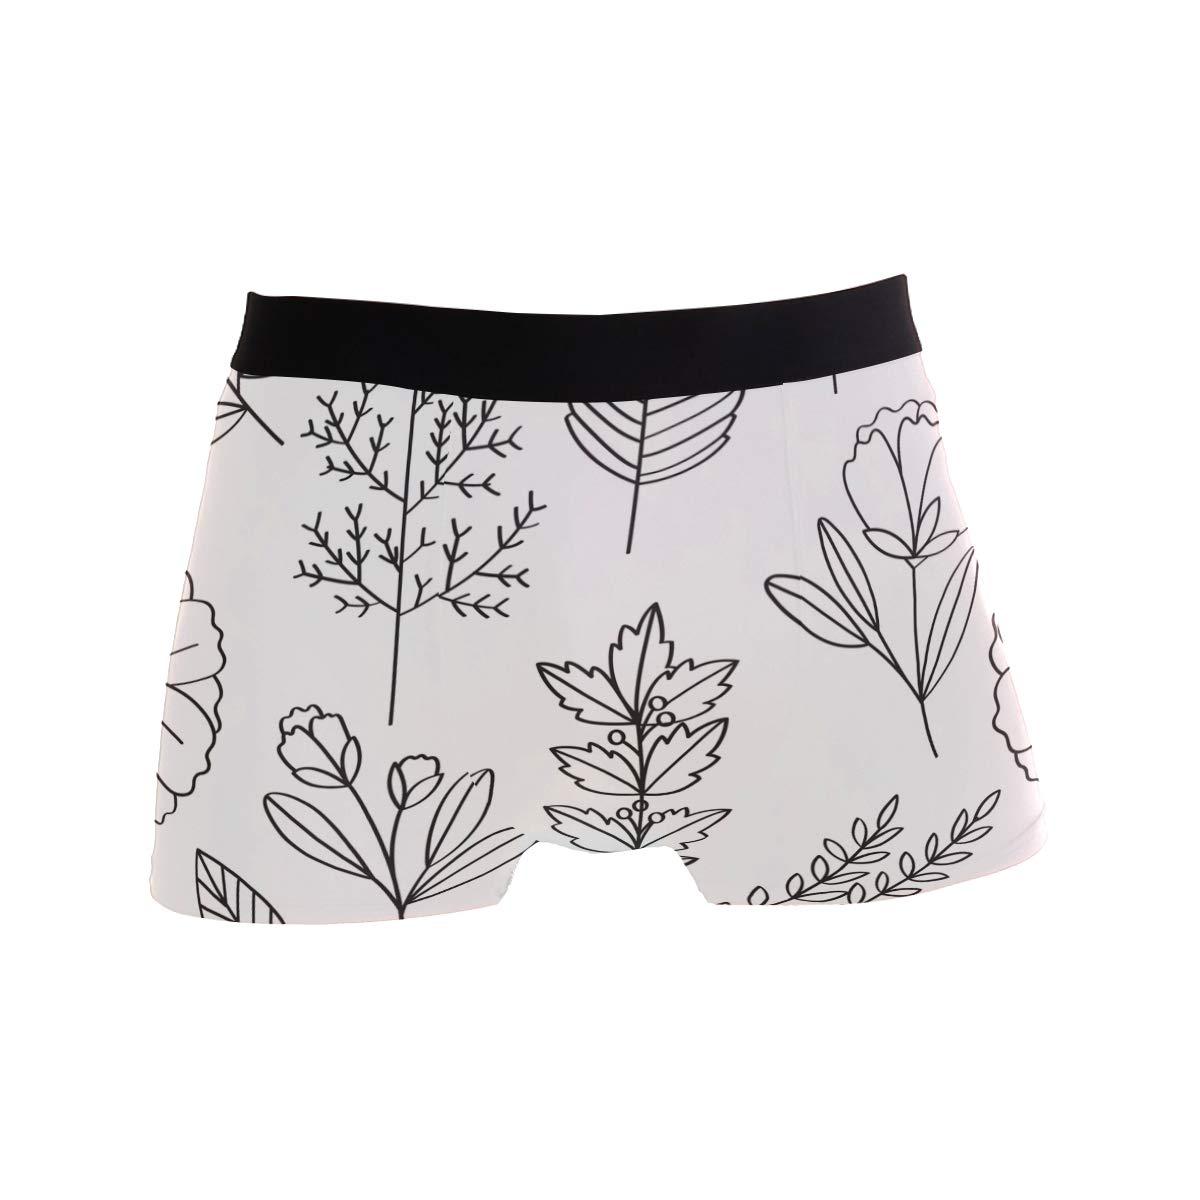 Simple Plant Leaves Pattern Men Underwear Elastic Boxer Briefs Soft Breathable S